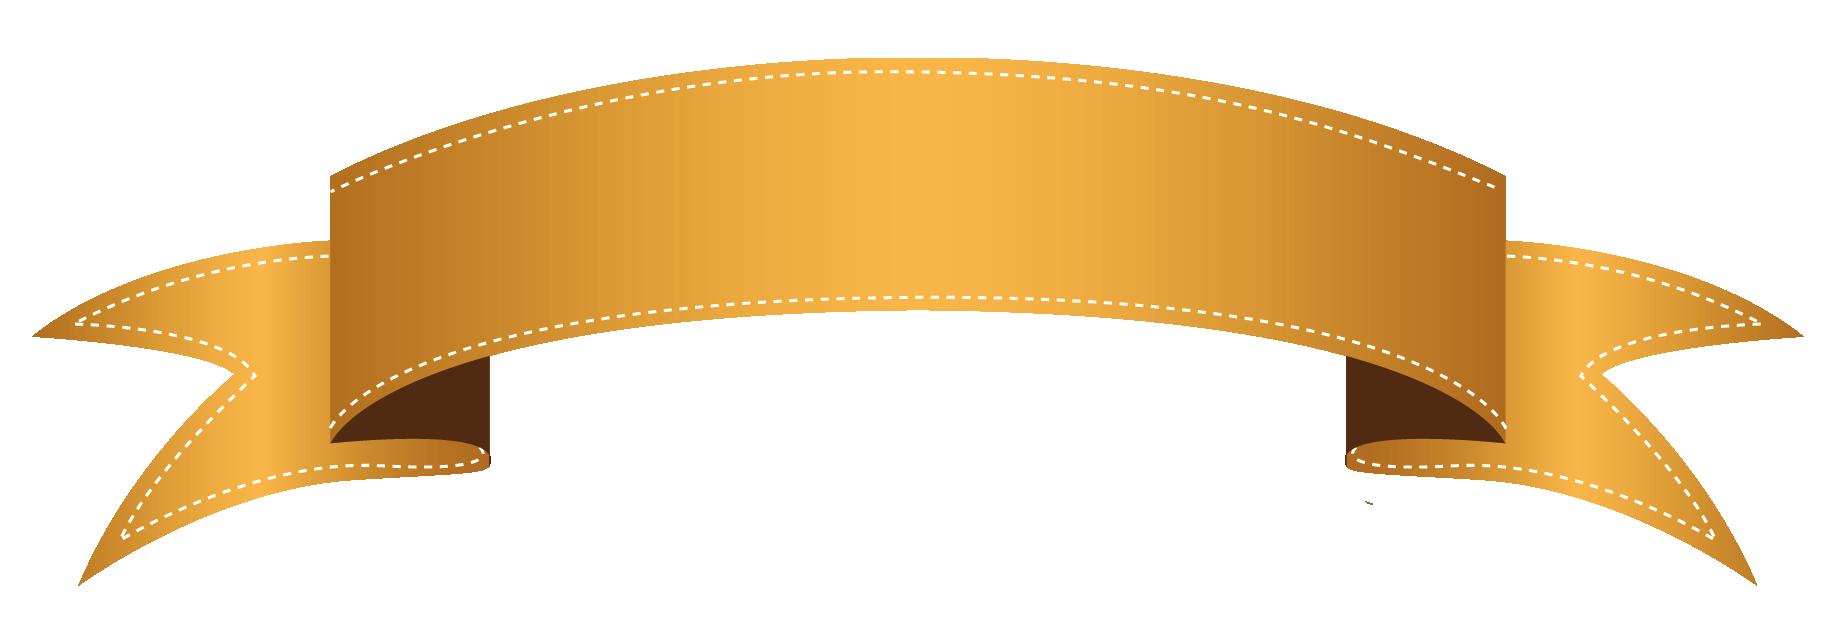 Orange transparent banner png. Music clipart ribbon